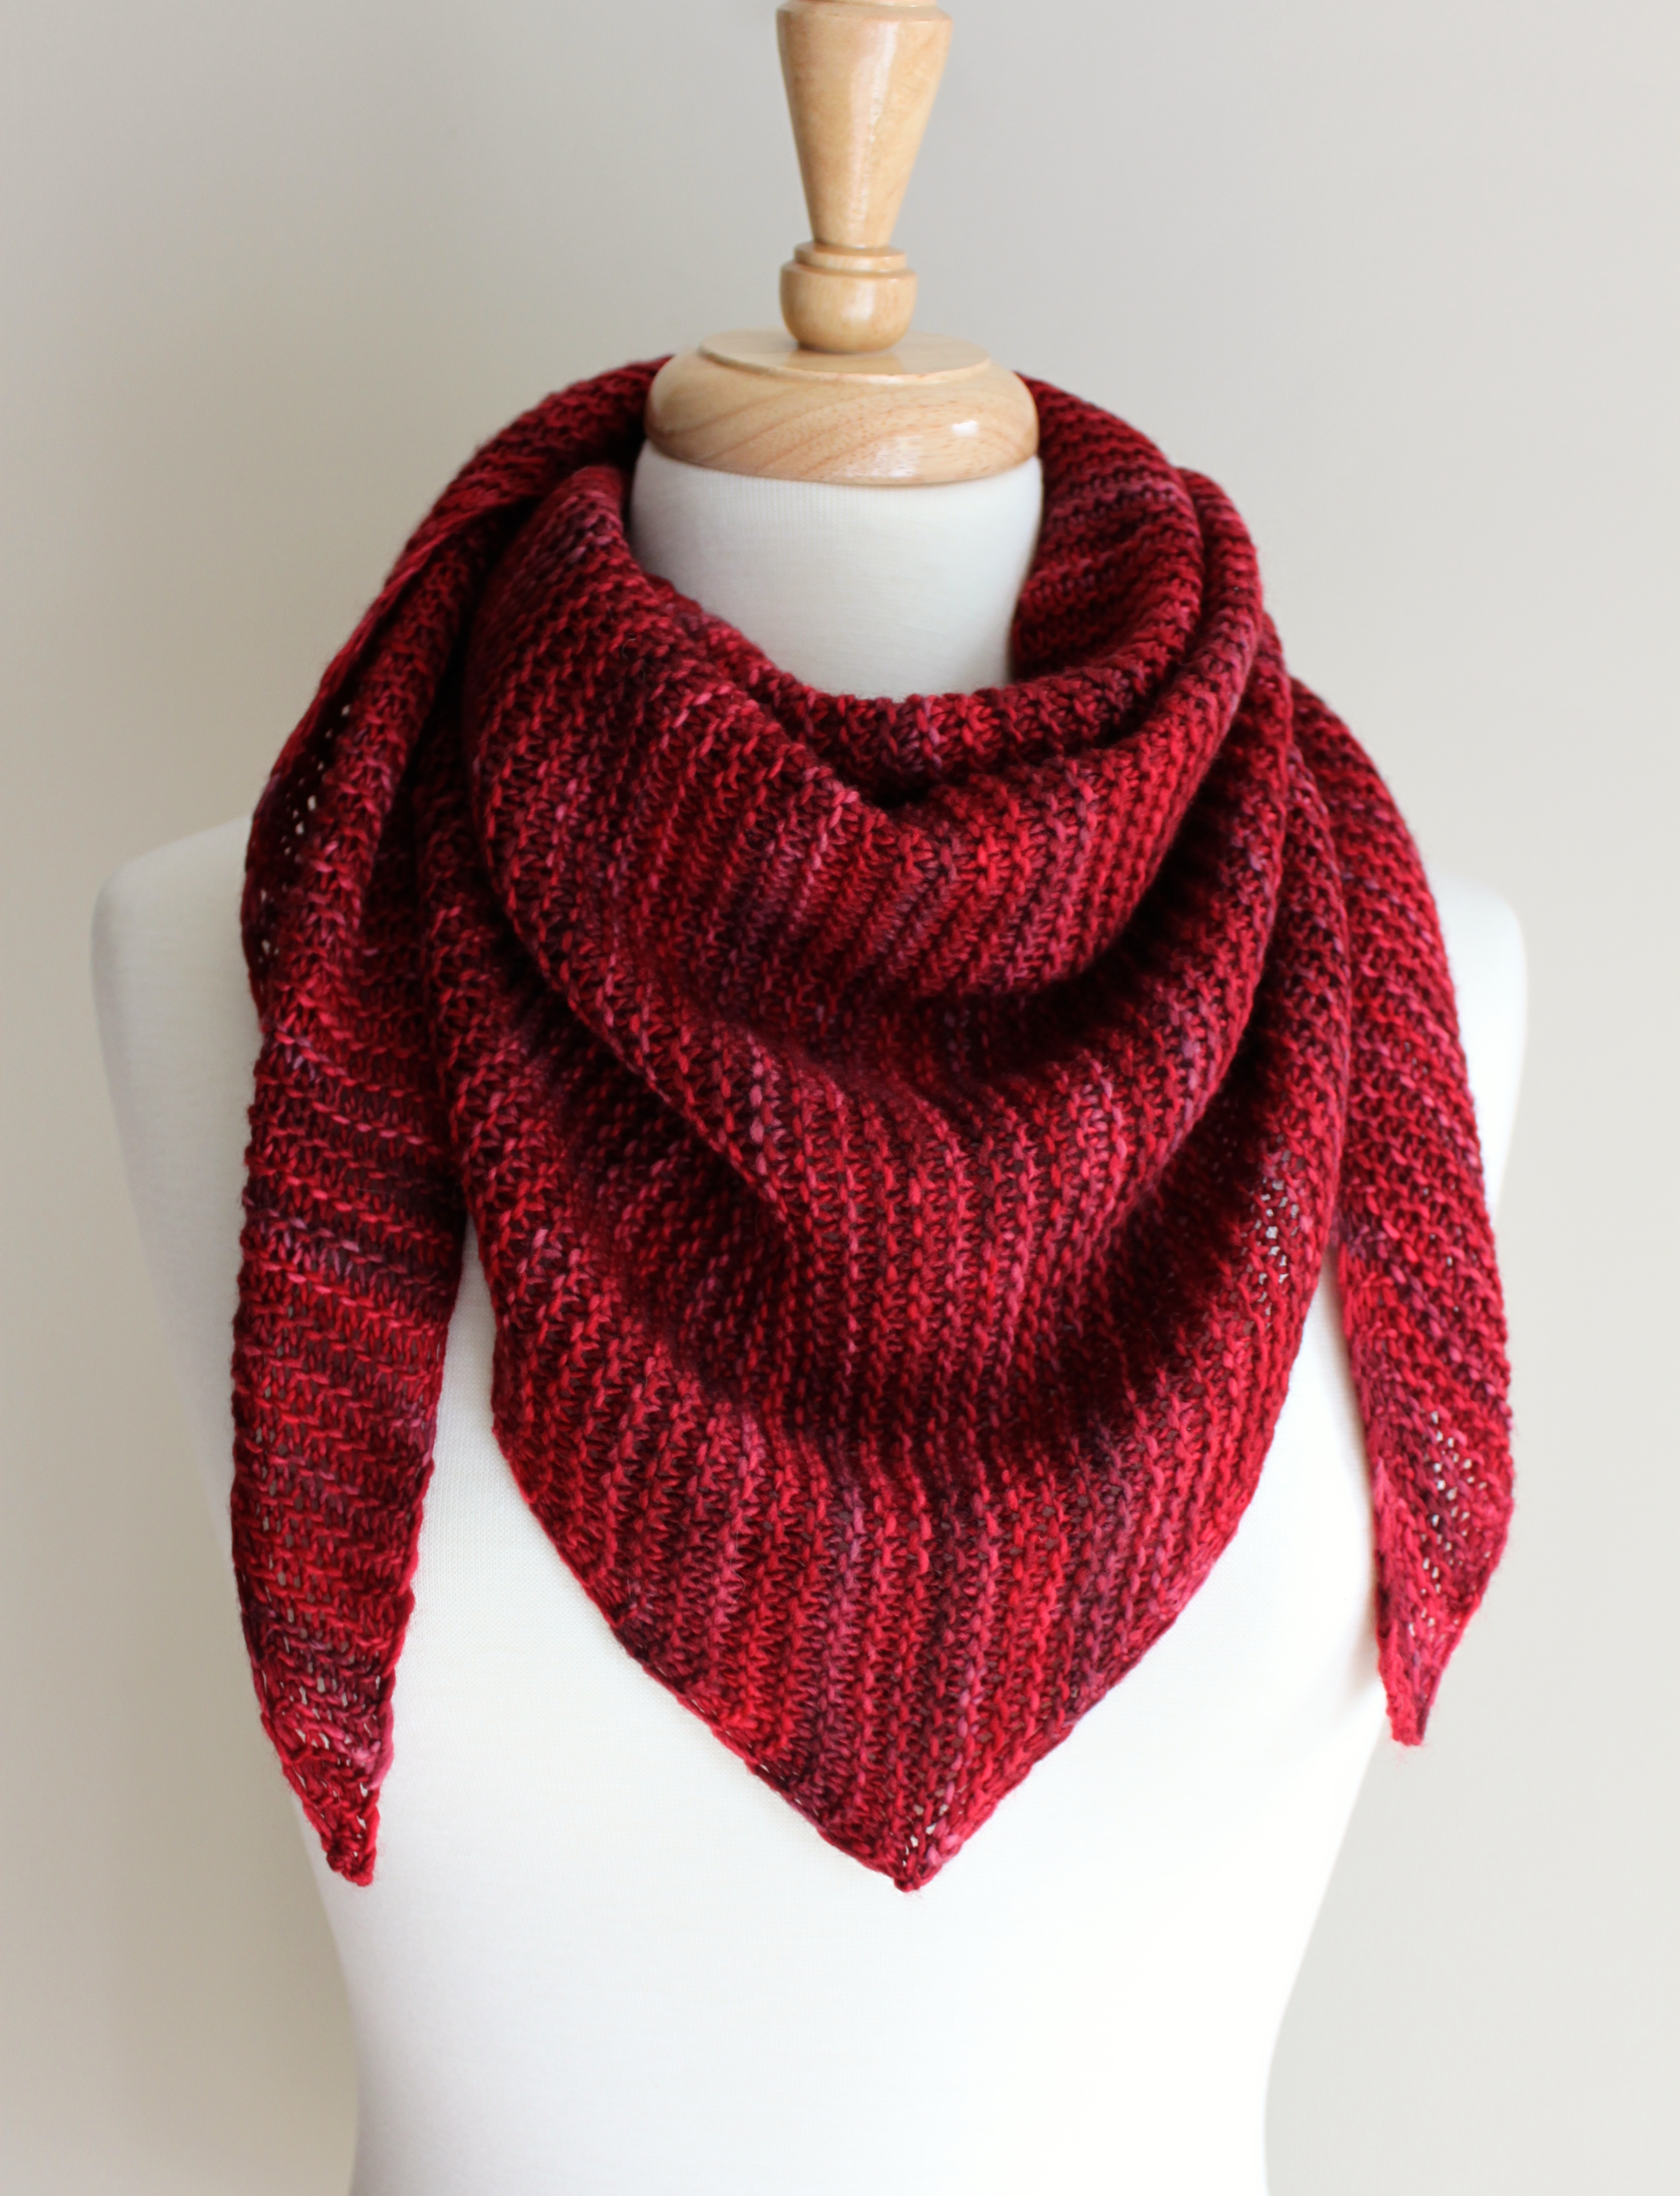 Free Knitting Patterns: Truly Triangular Scarf - Leah ...